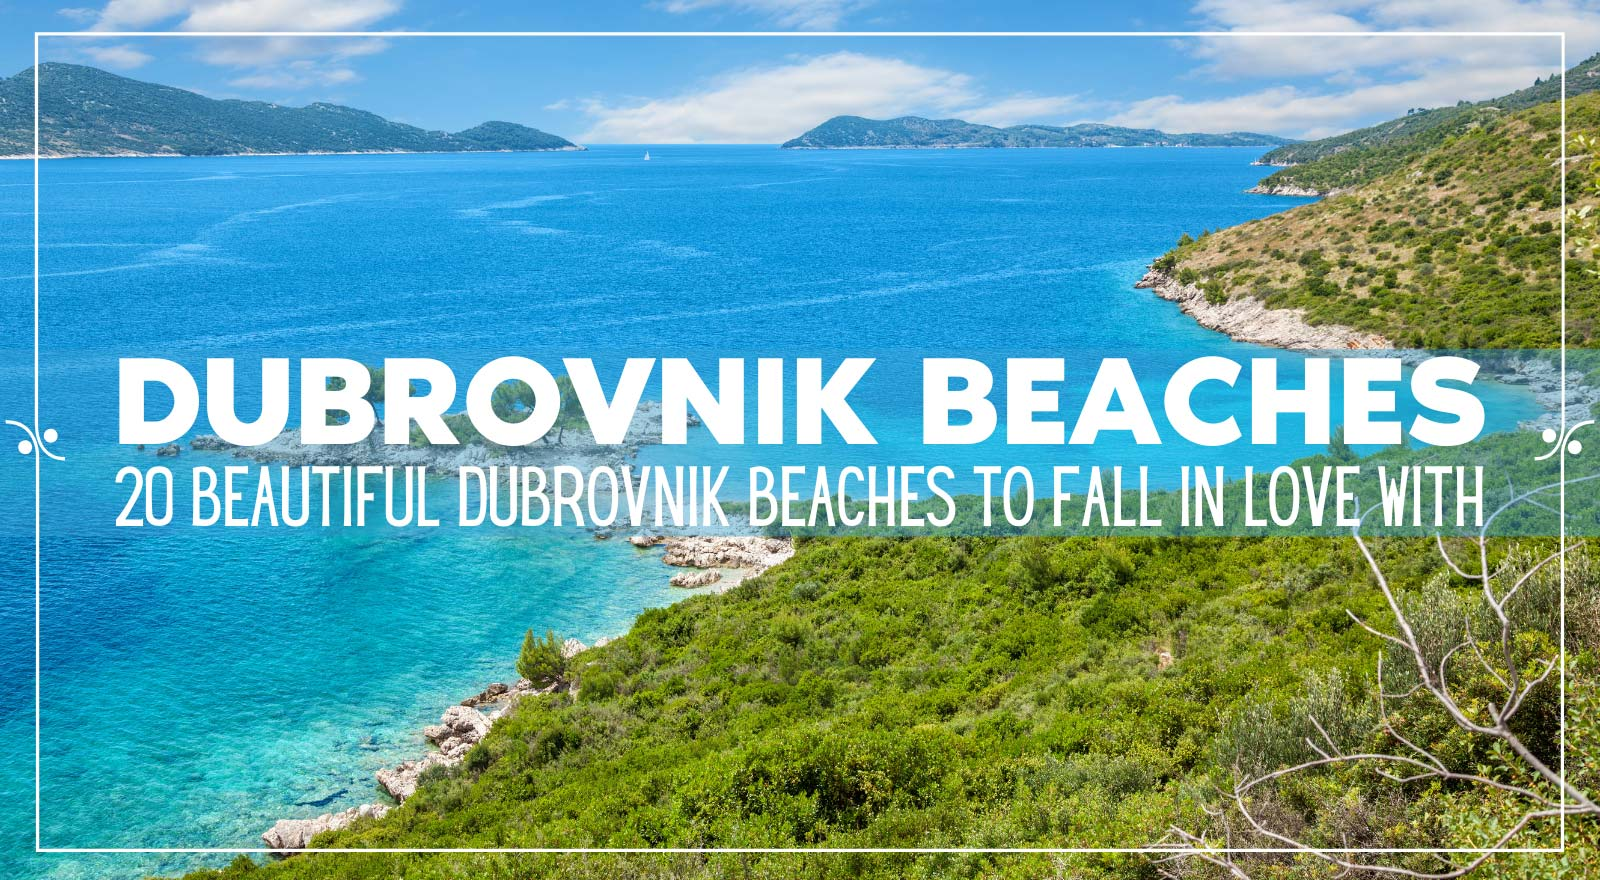 The Best Dubrovnik Beaches, Illustration